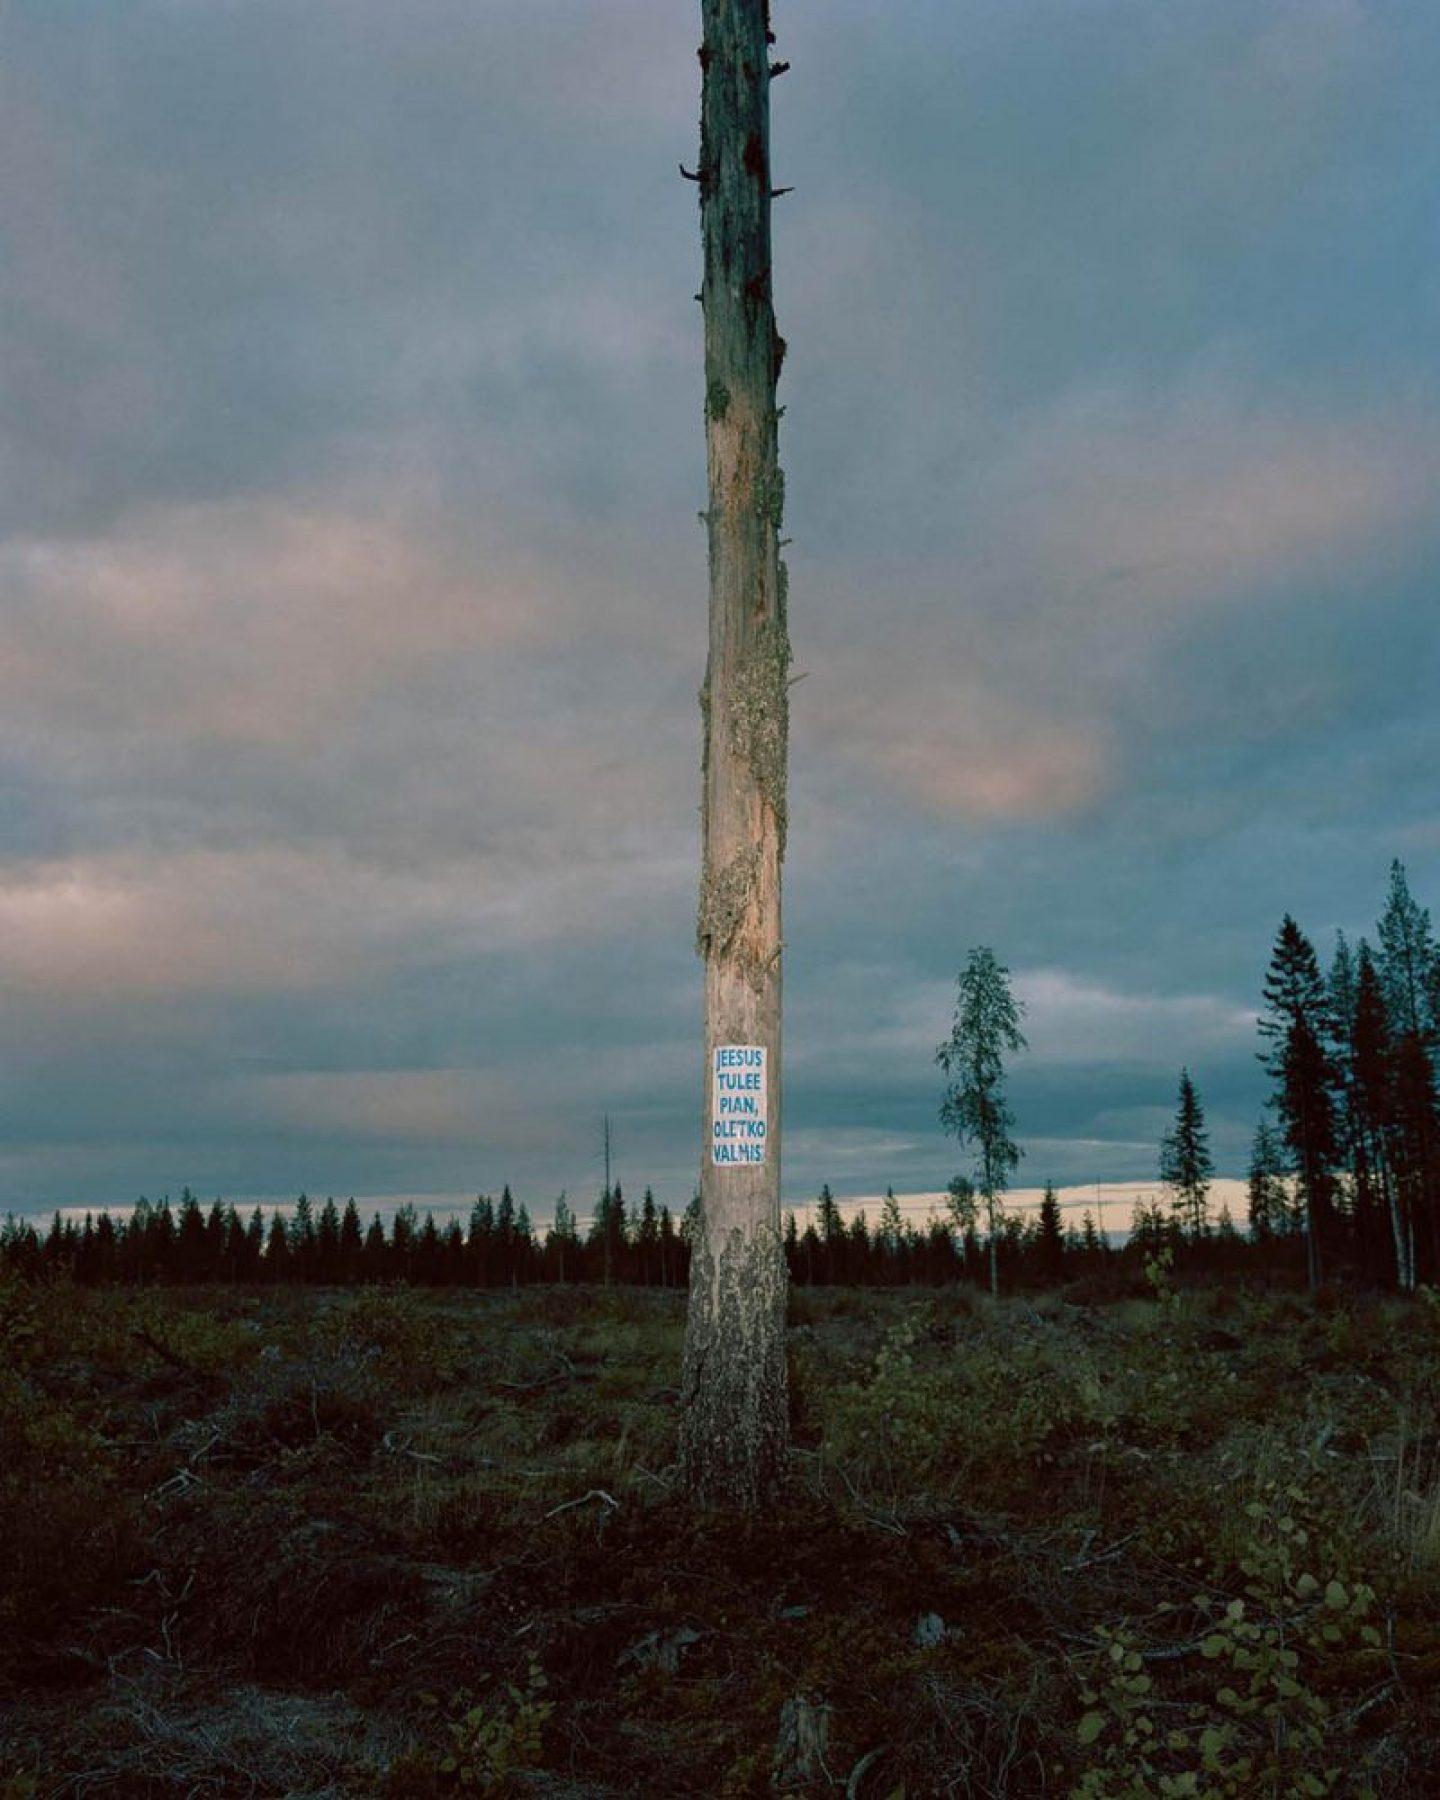 iGNANT_Photography_Aapo_Huhta_Ukkometso_Finland_3